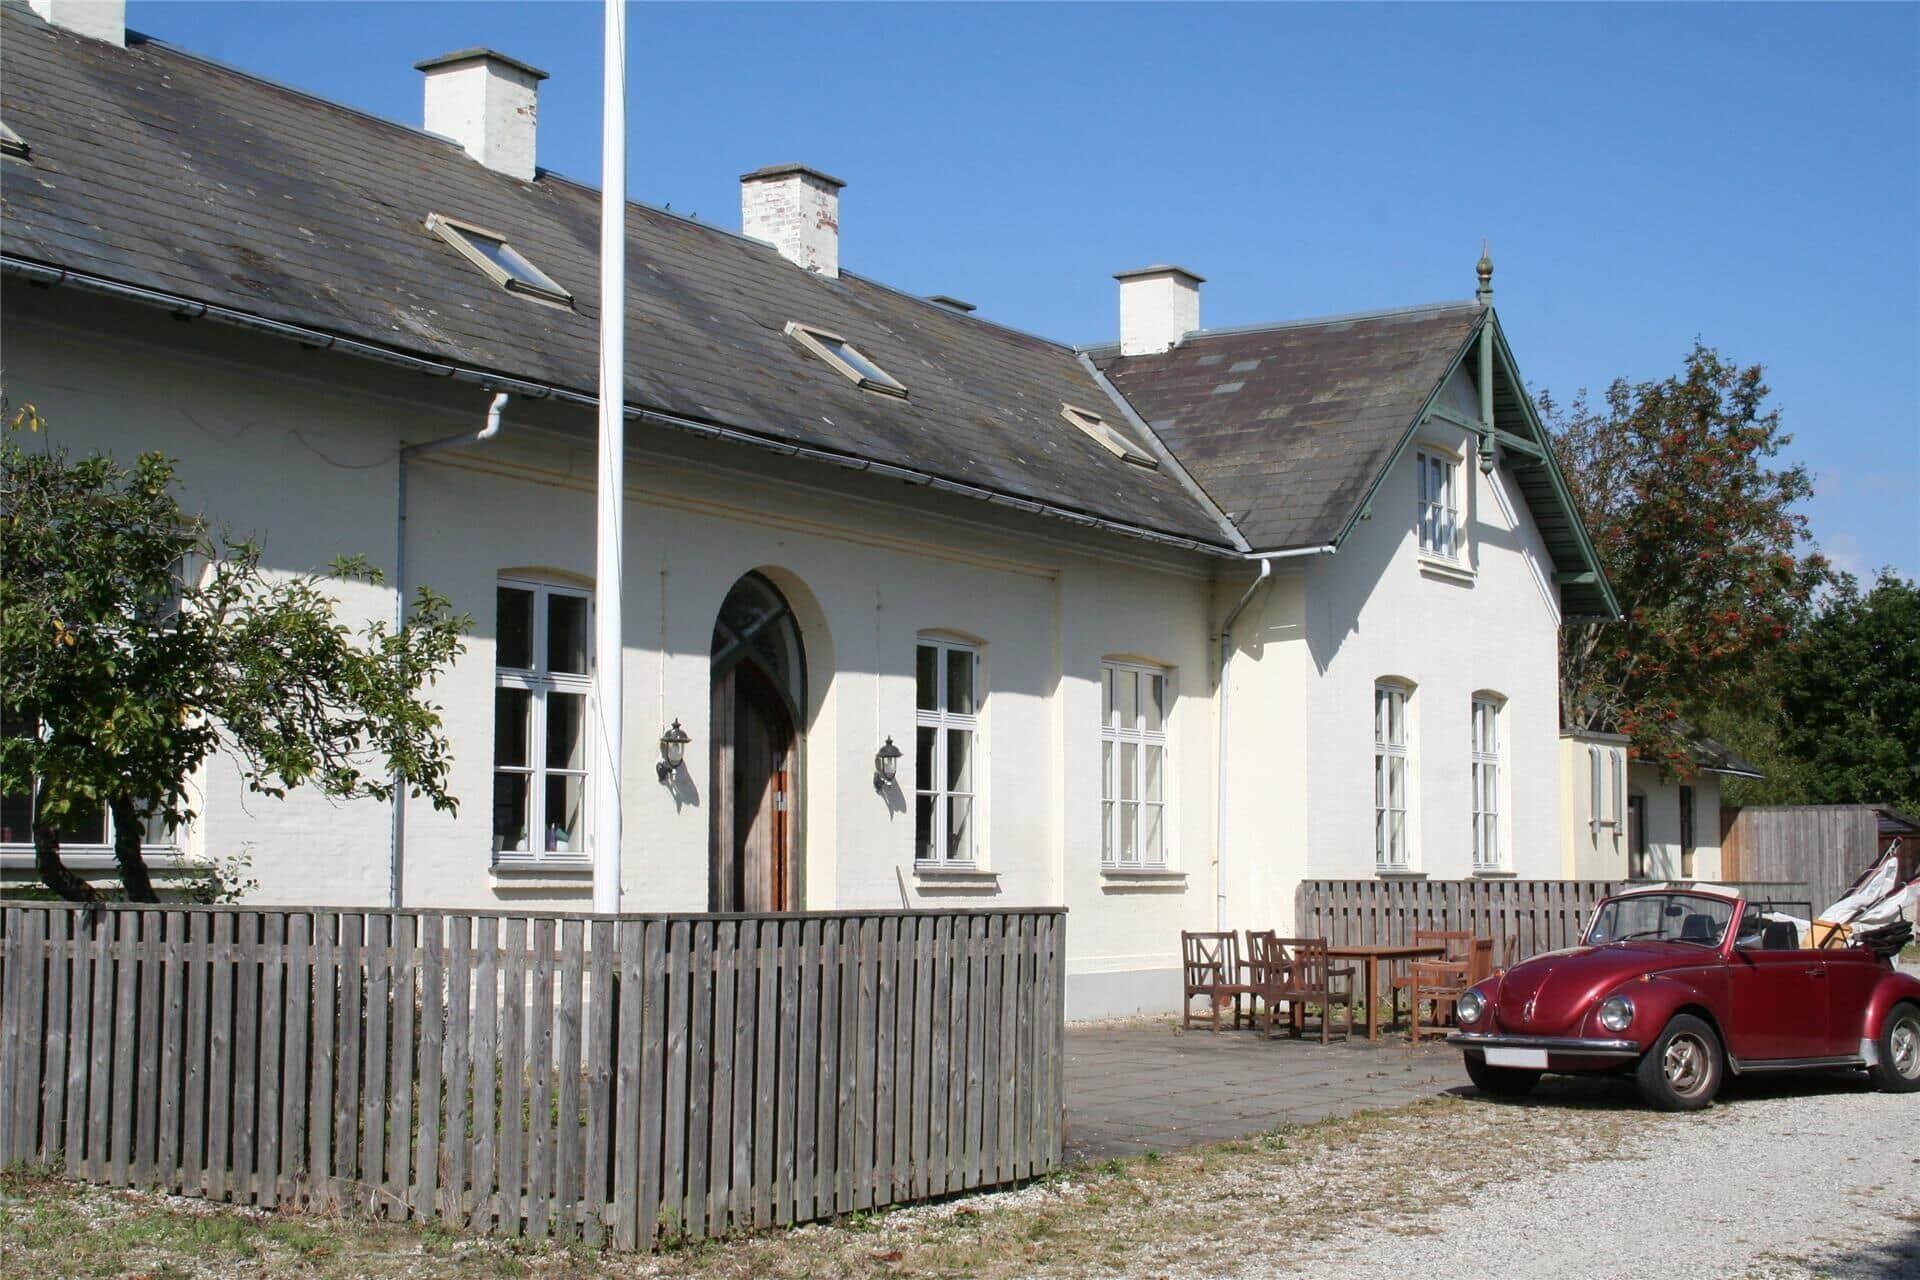 Billede 1-3 Sommerhus M65700, Frederiksbergvej 20, DK - 5600 Faaborg